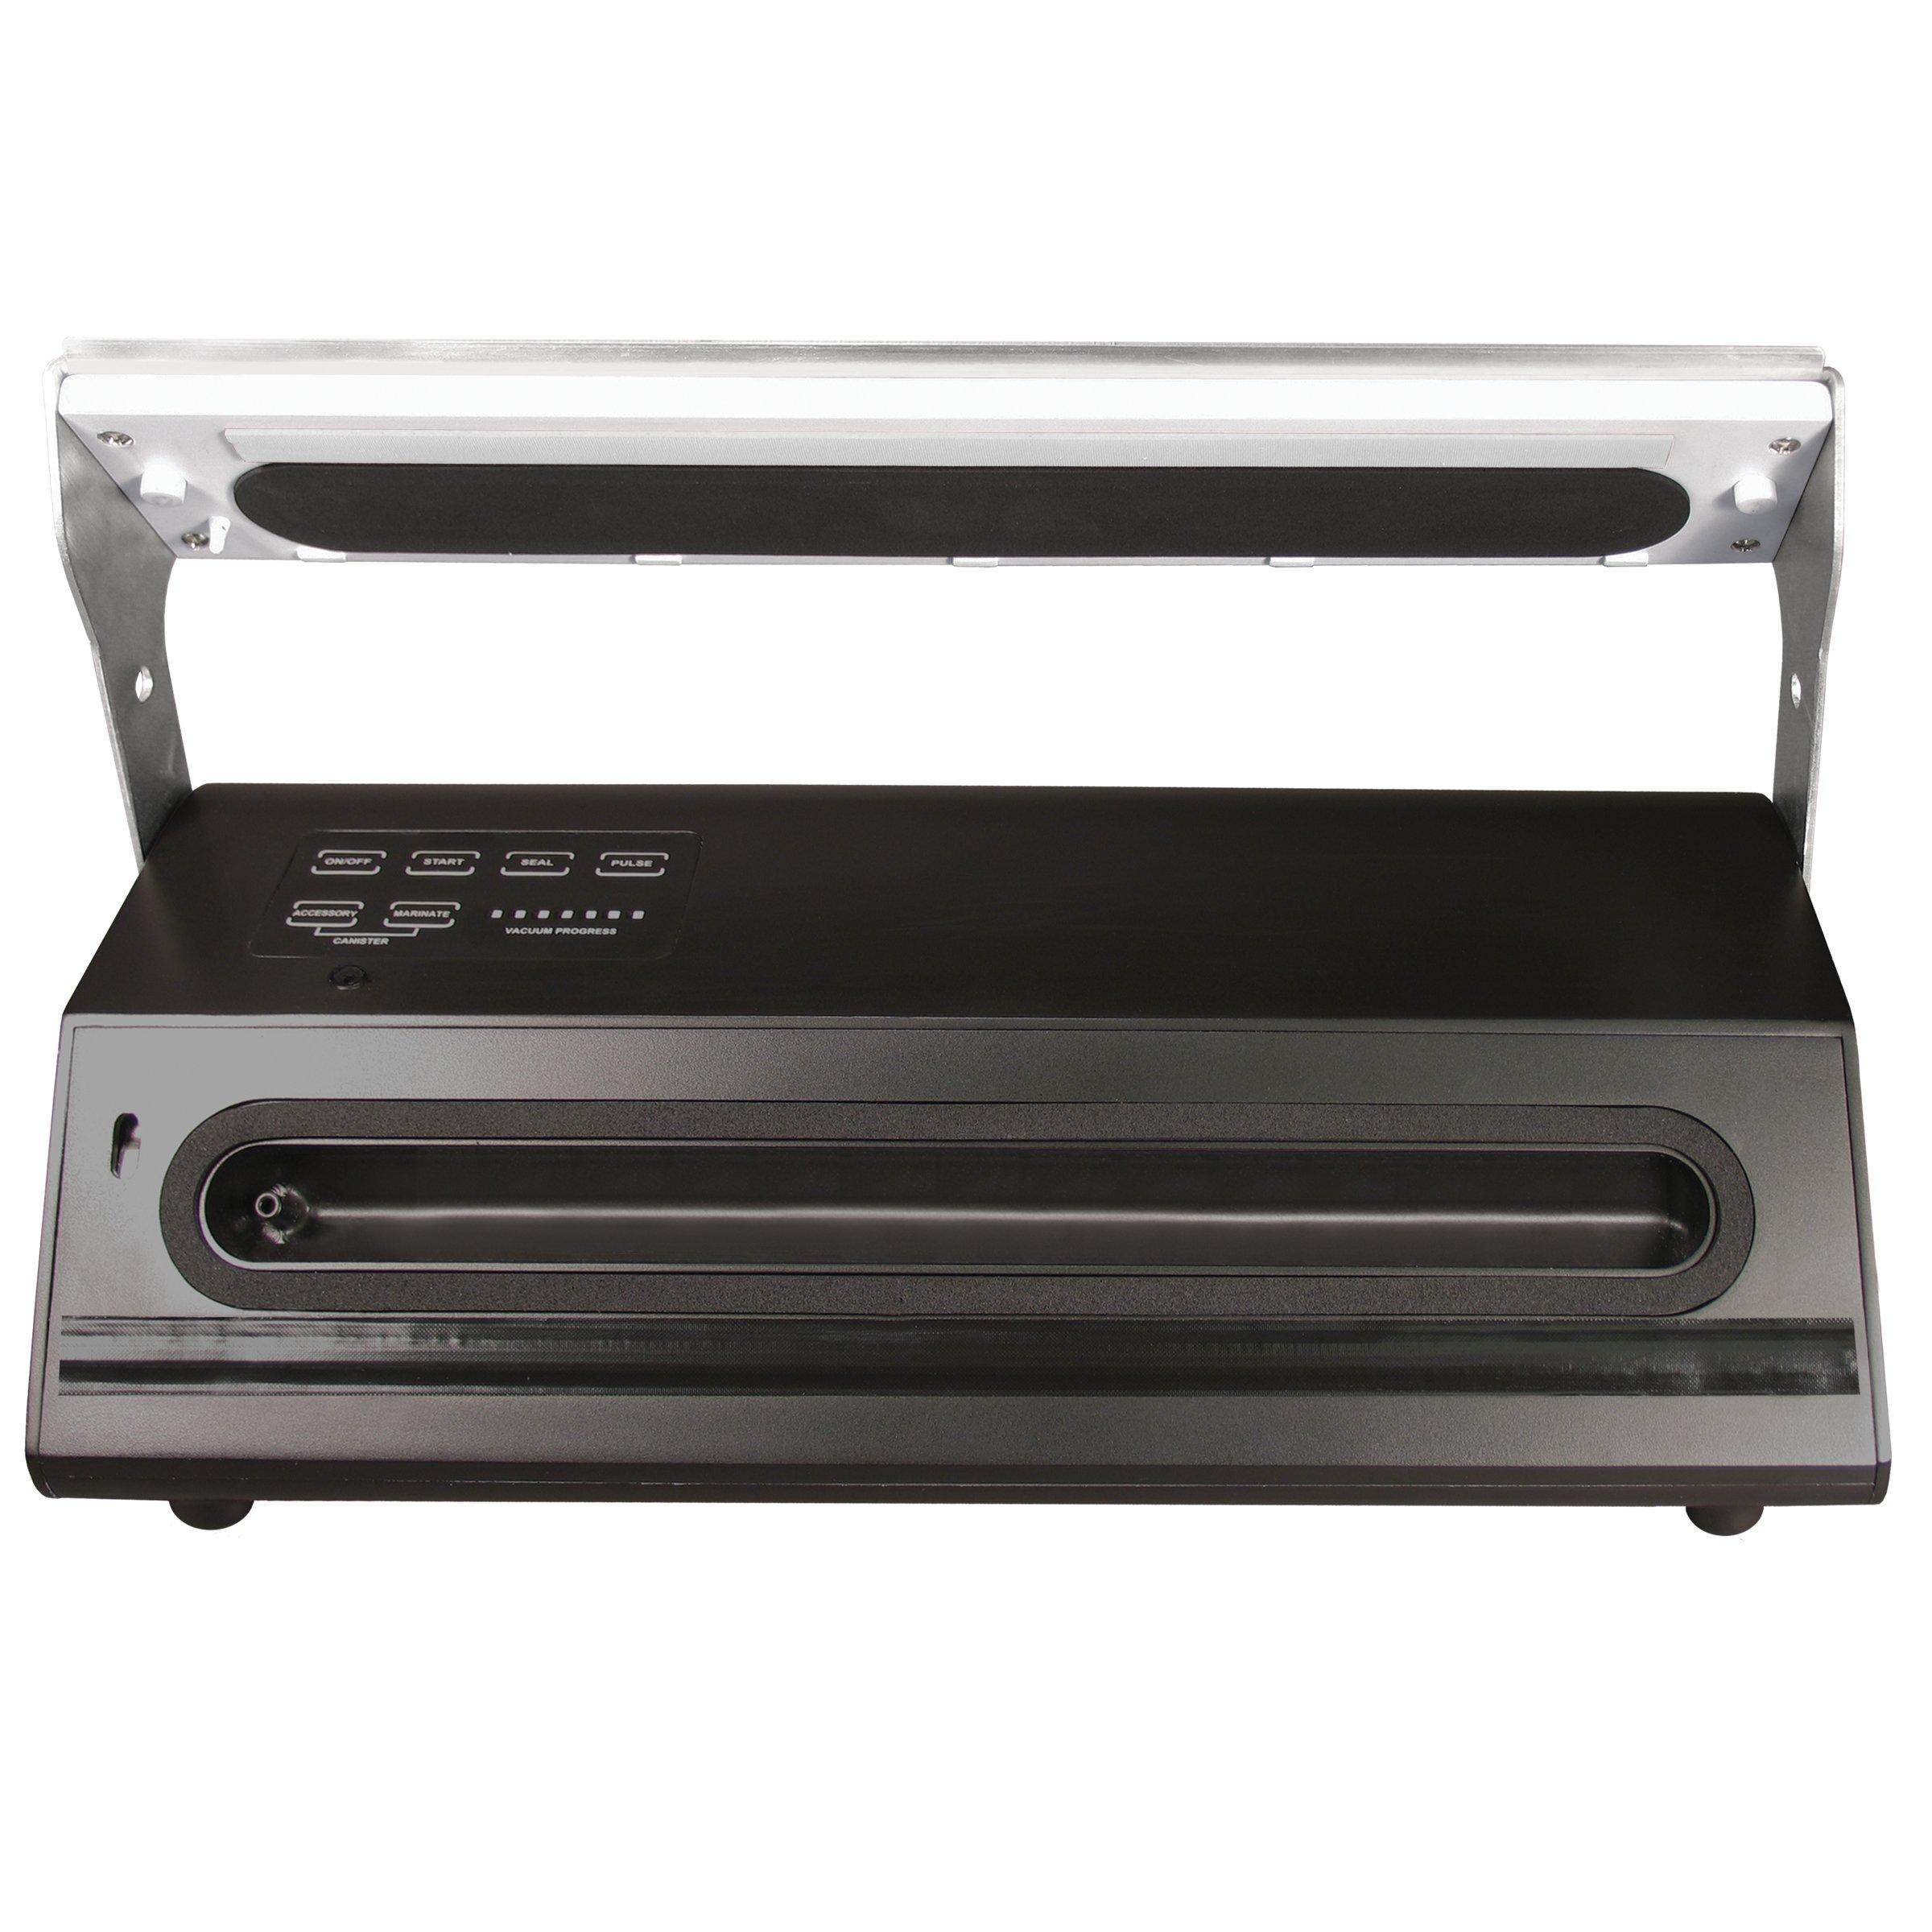 Weston 65-0501-W Professional Advantage Vacuum Sealer, 11-inch, Silver (65-0501-W) by Weston (Image #3)